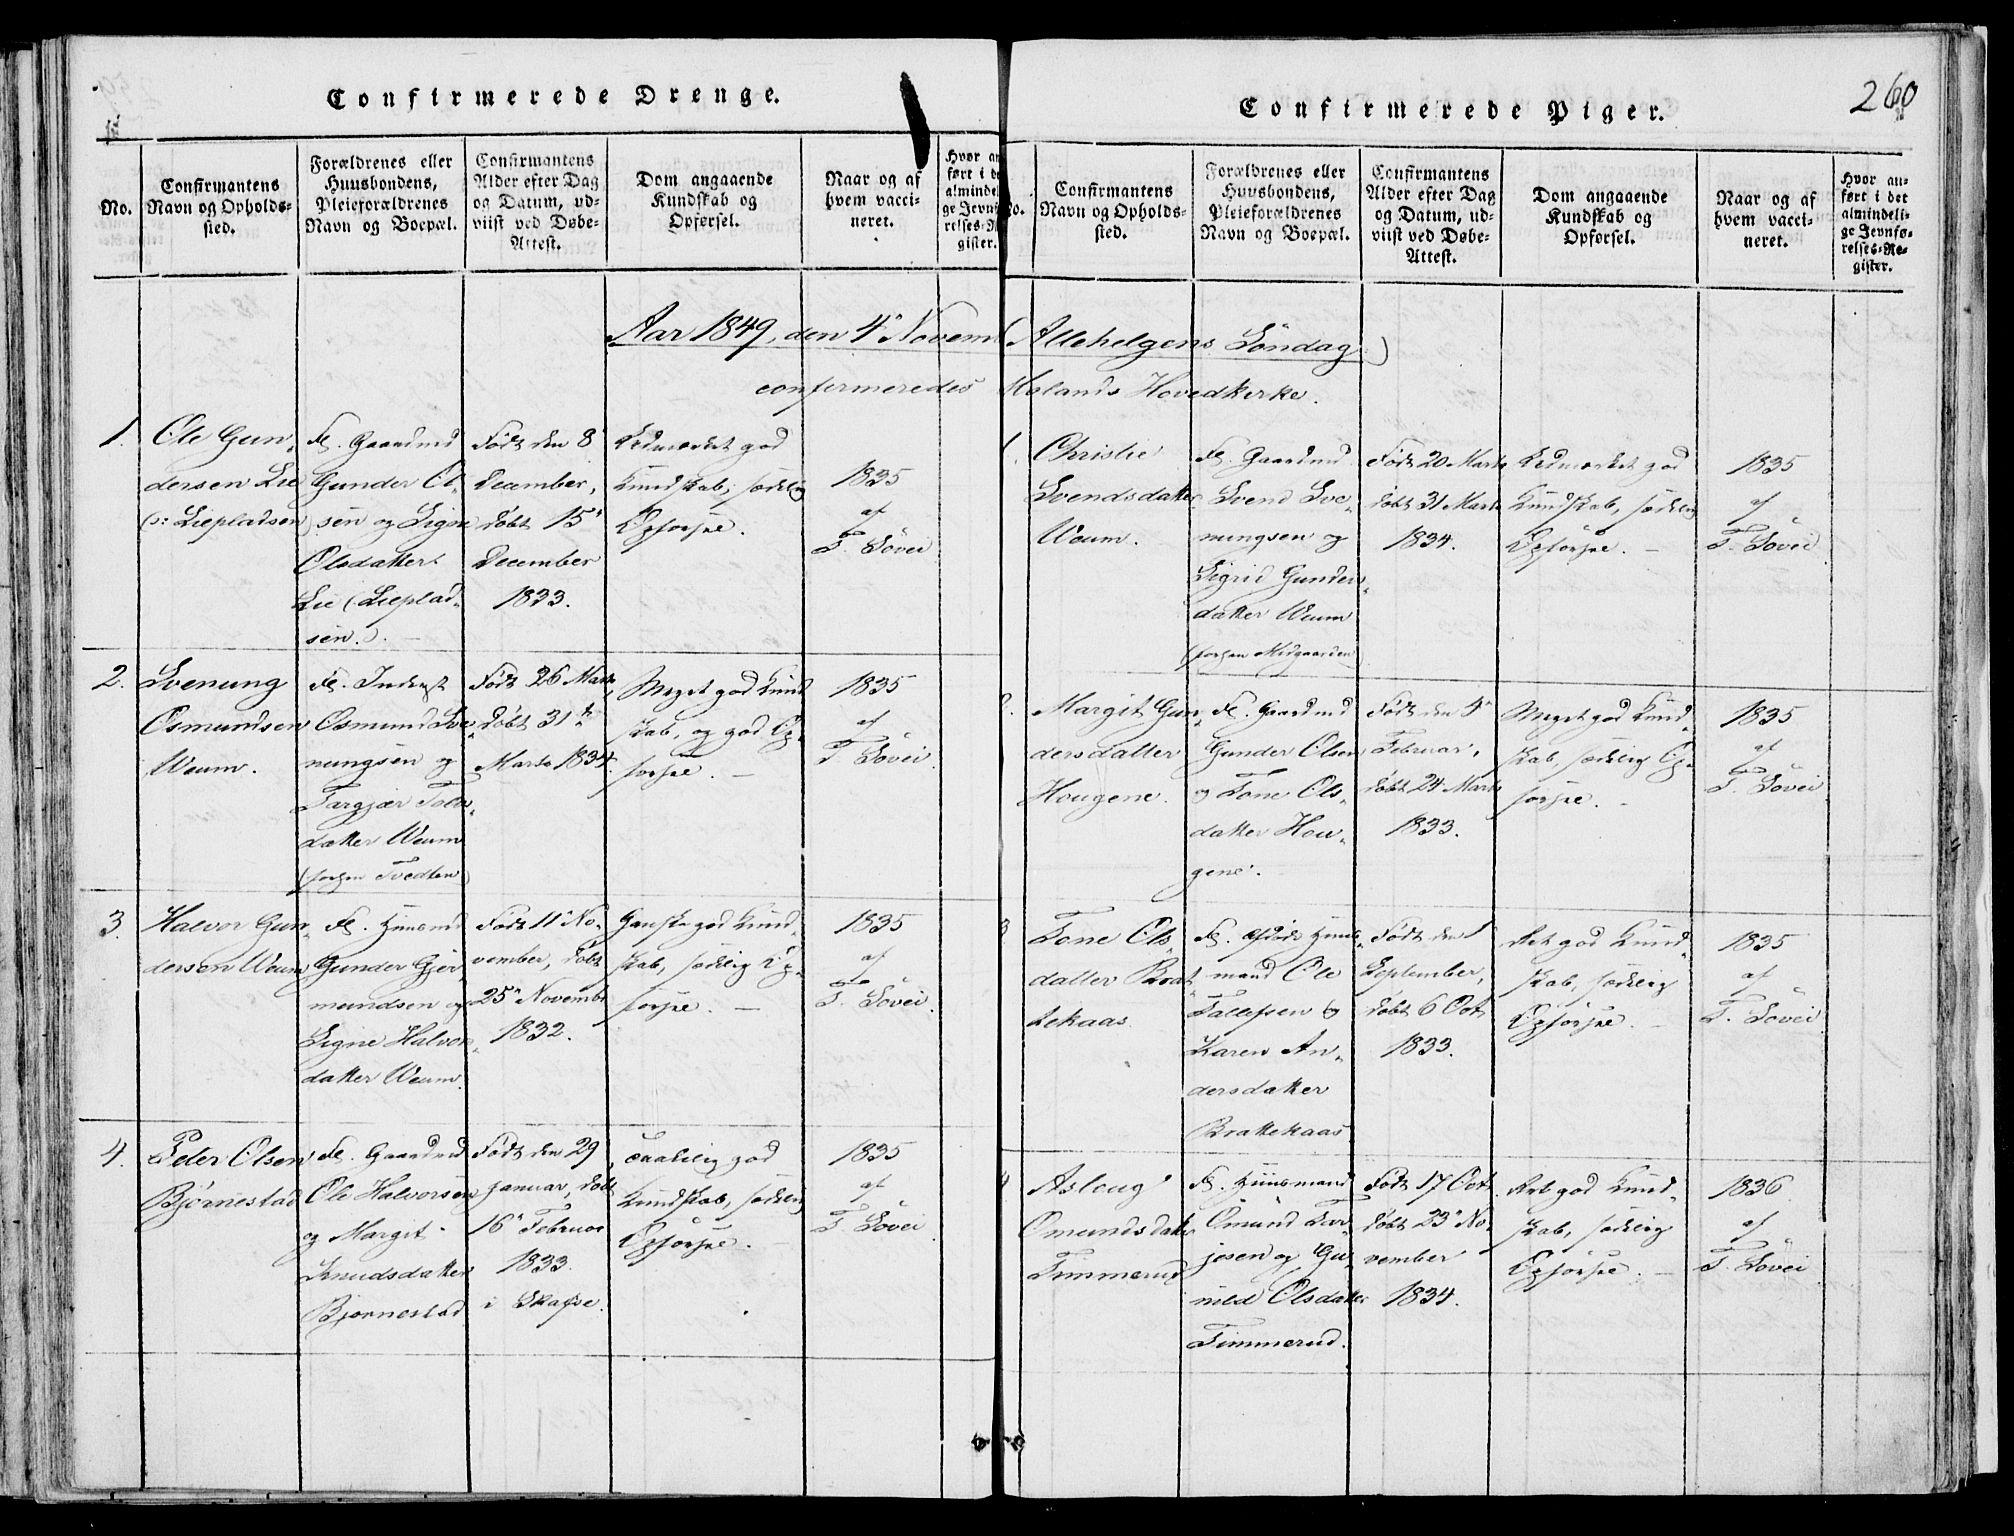 SAKO, Fyresdal kirkebøker, F/Fb/L0001: Ministerialbok nr. II 1, 1815-1854, s. 260